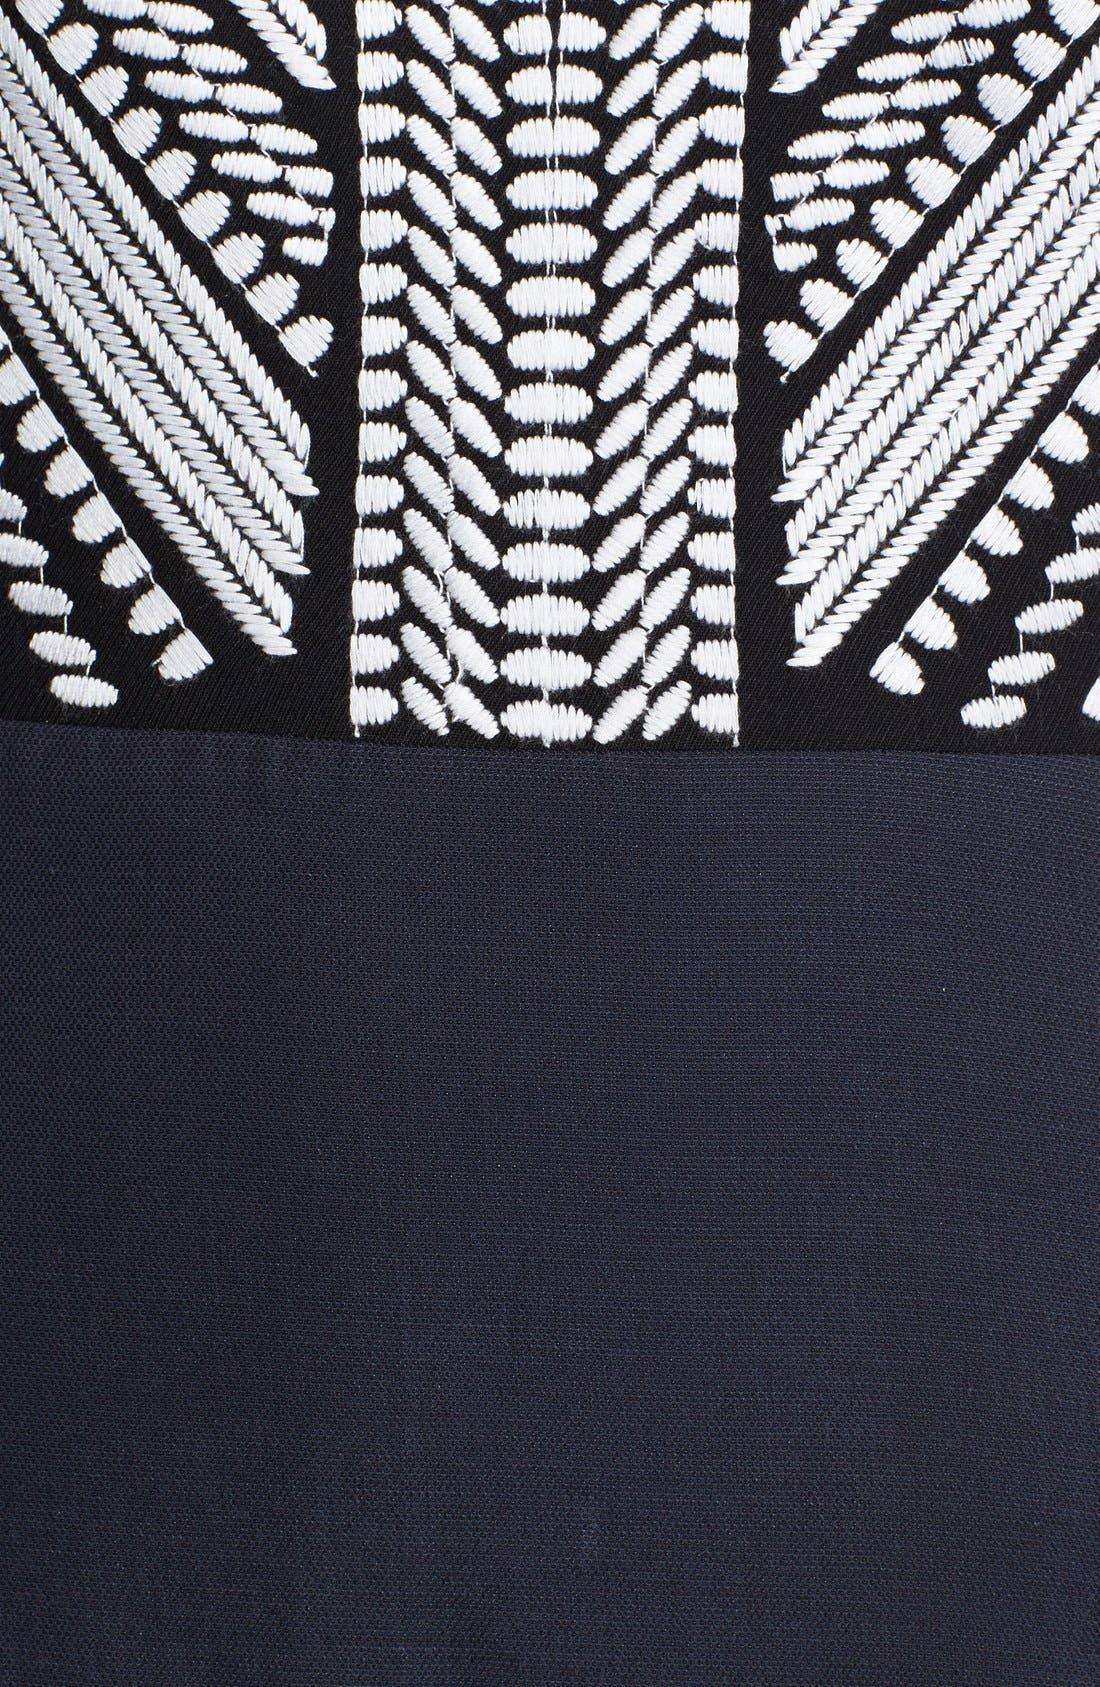 Alternate Image 3  - Tibi 'Fog' Embroidered A-Line Dress